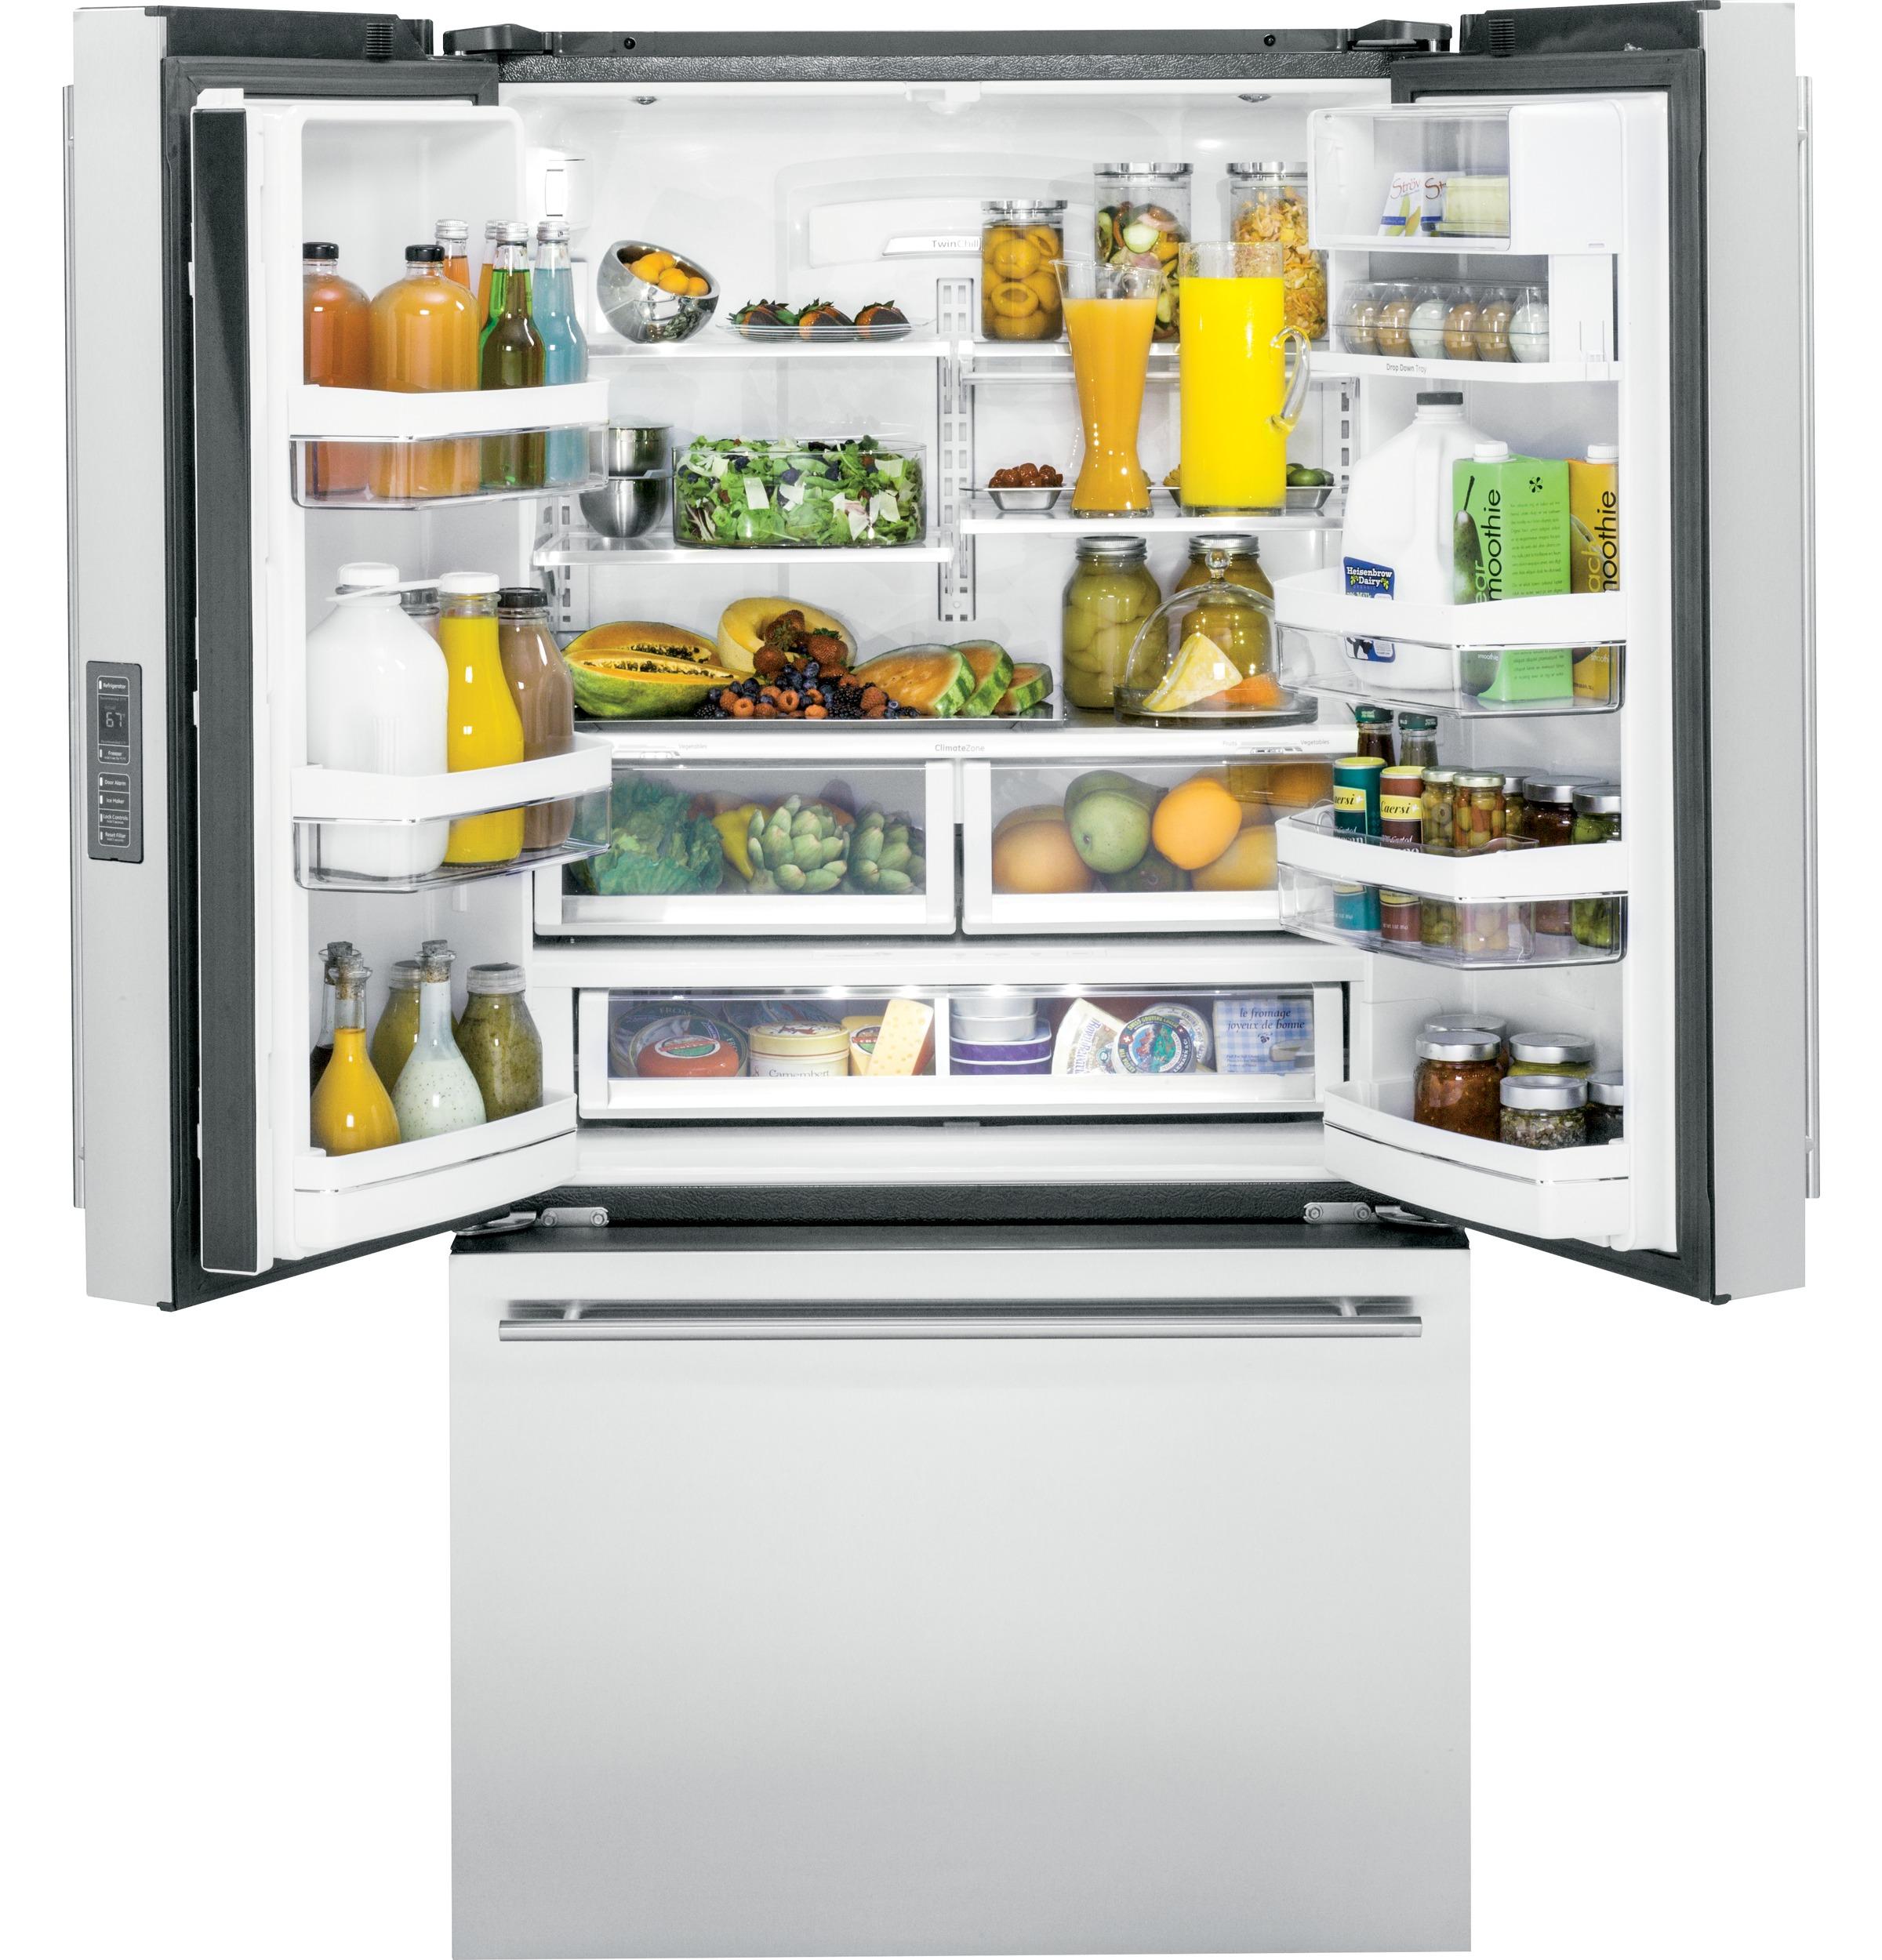 Monogram ENERGY STAR® 23.1 Cu. Ft. Counter-Depth French-Door Refrigerator